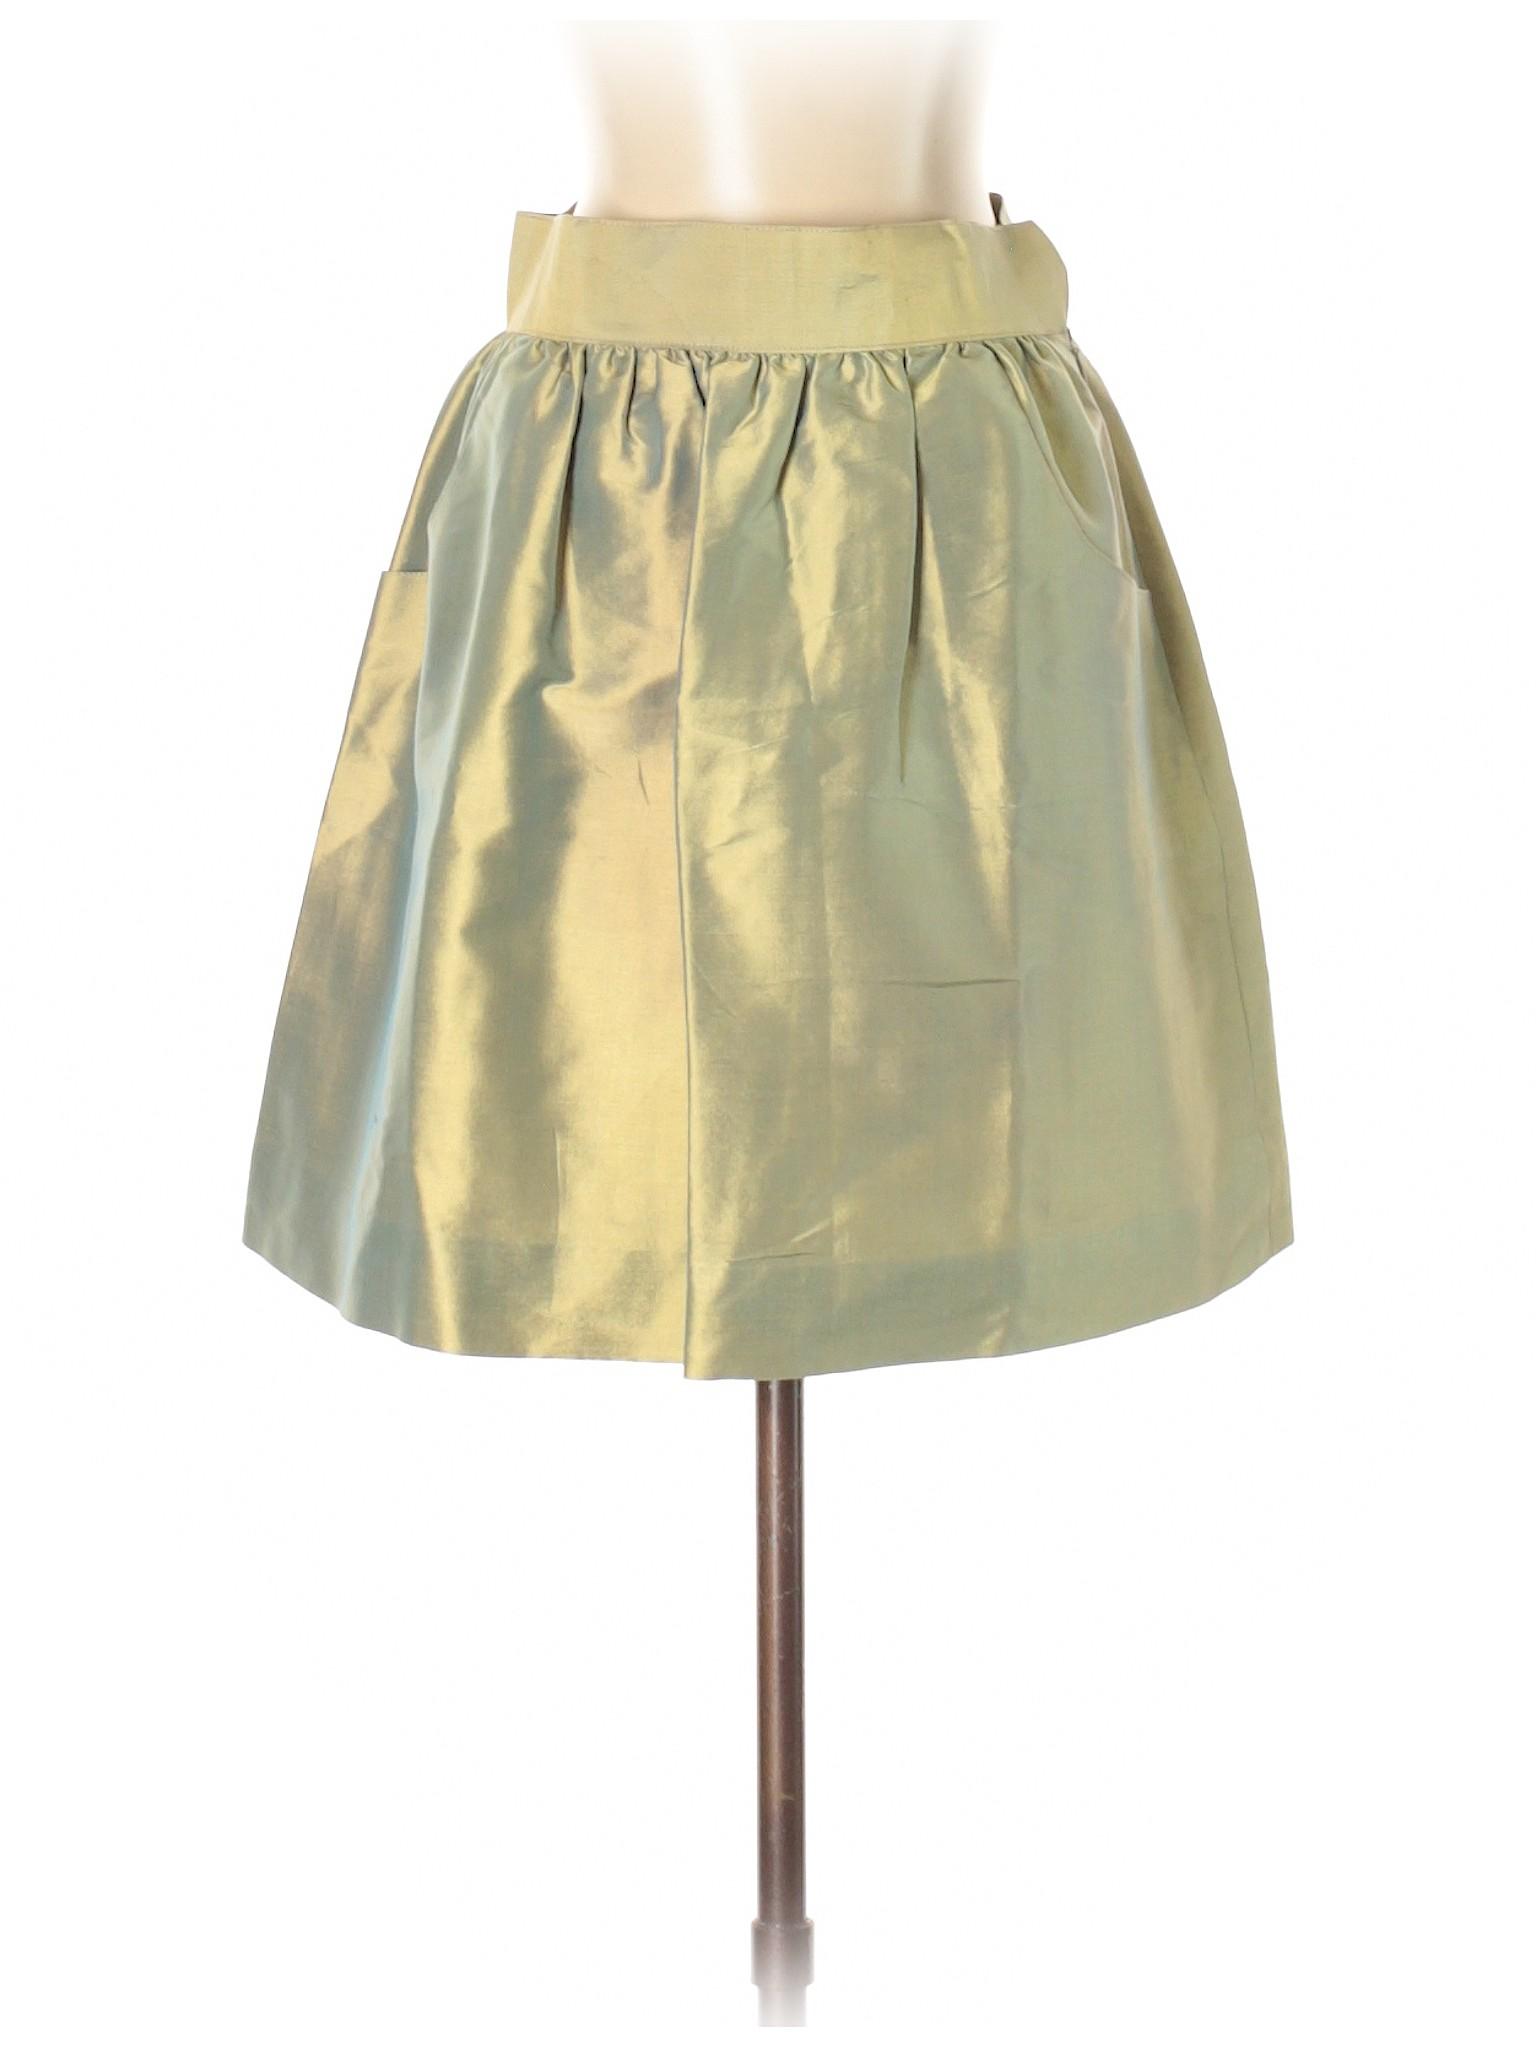 Mith Boutique Skirt leisure Silk leisure Boutique WBnqnYwPa